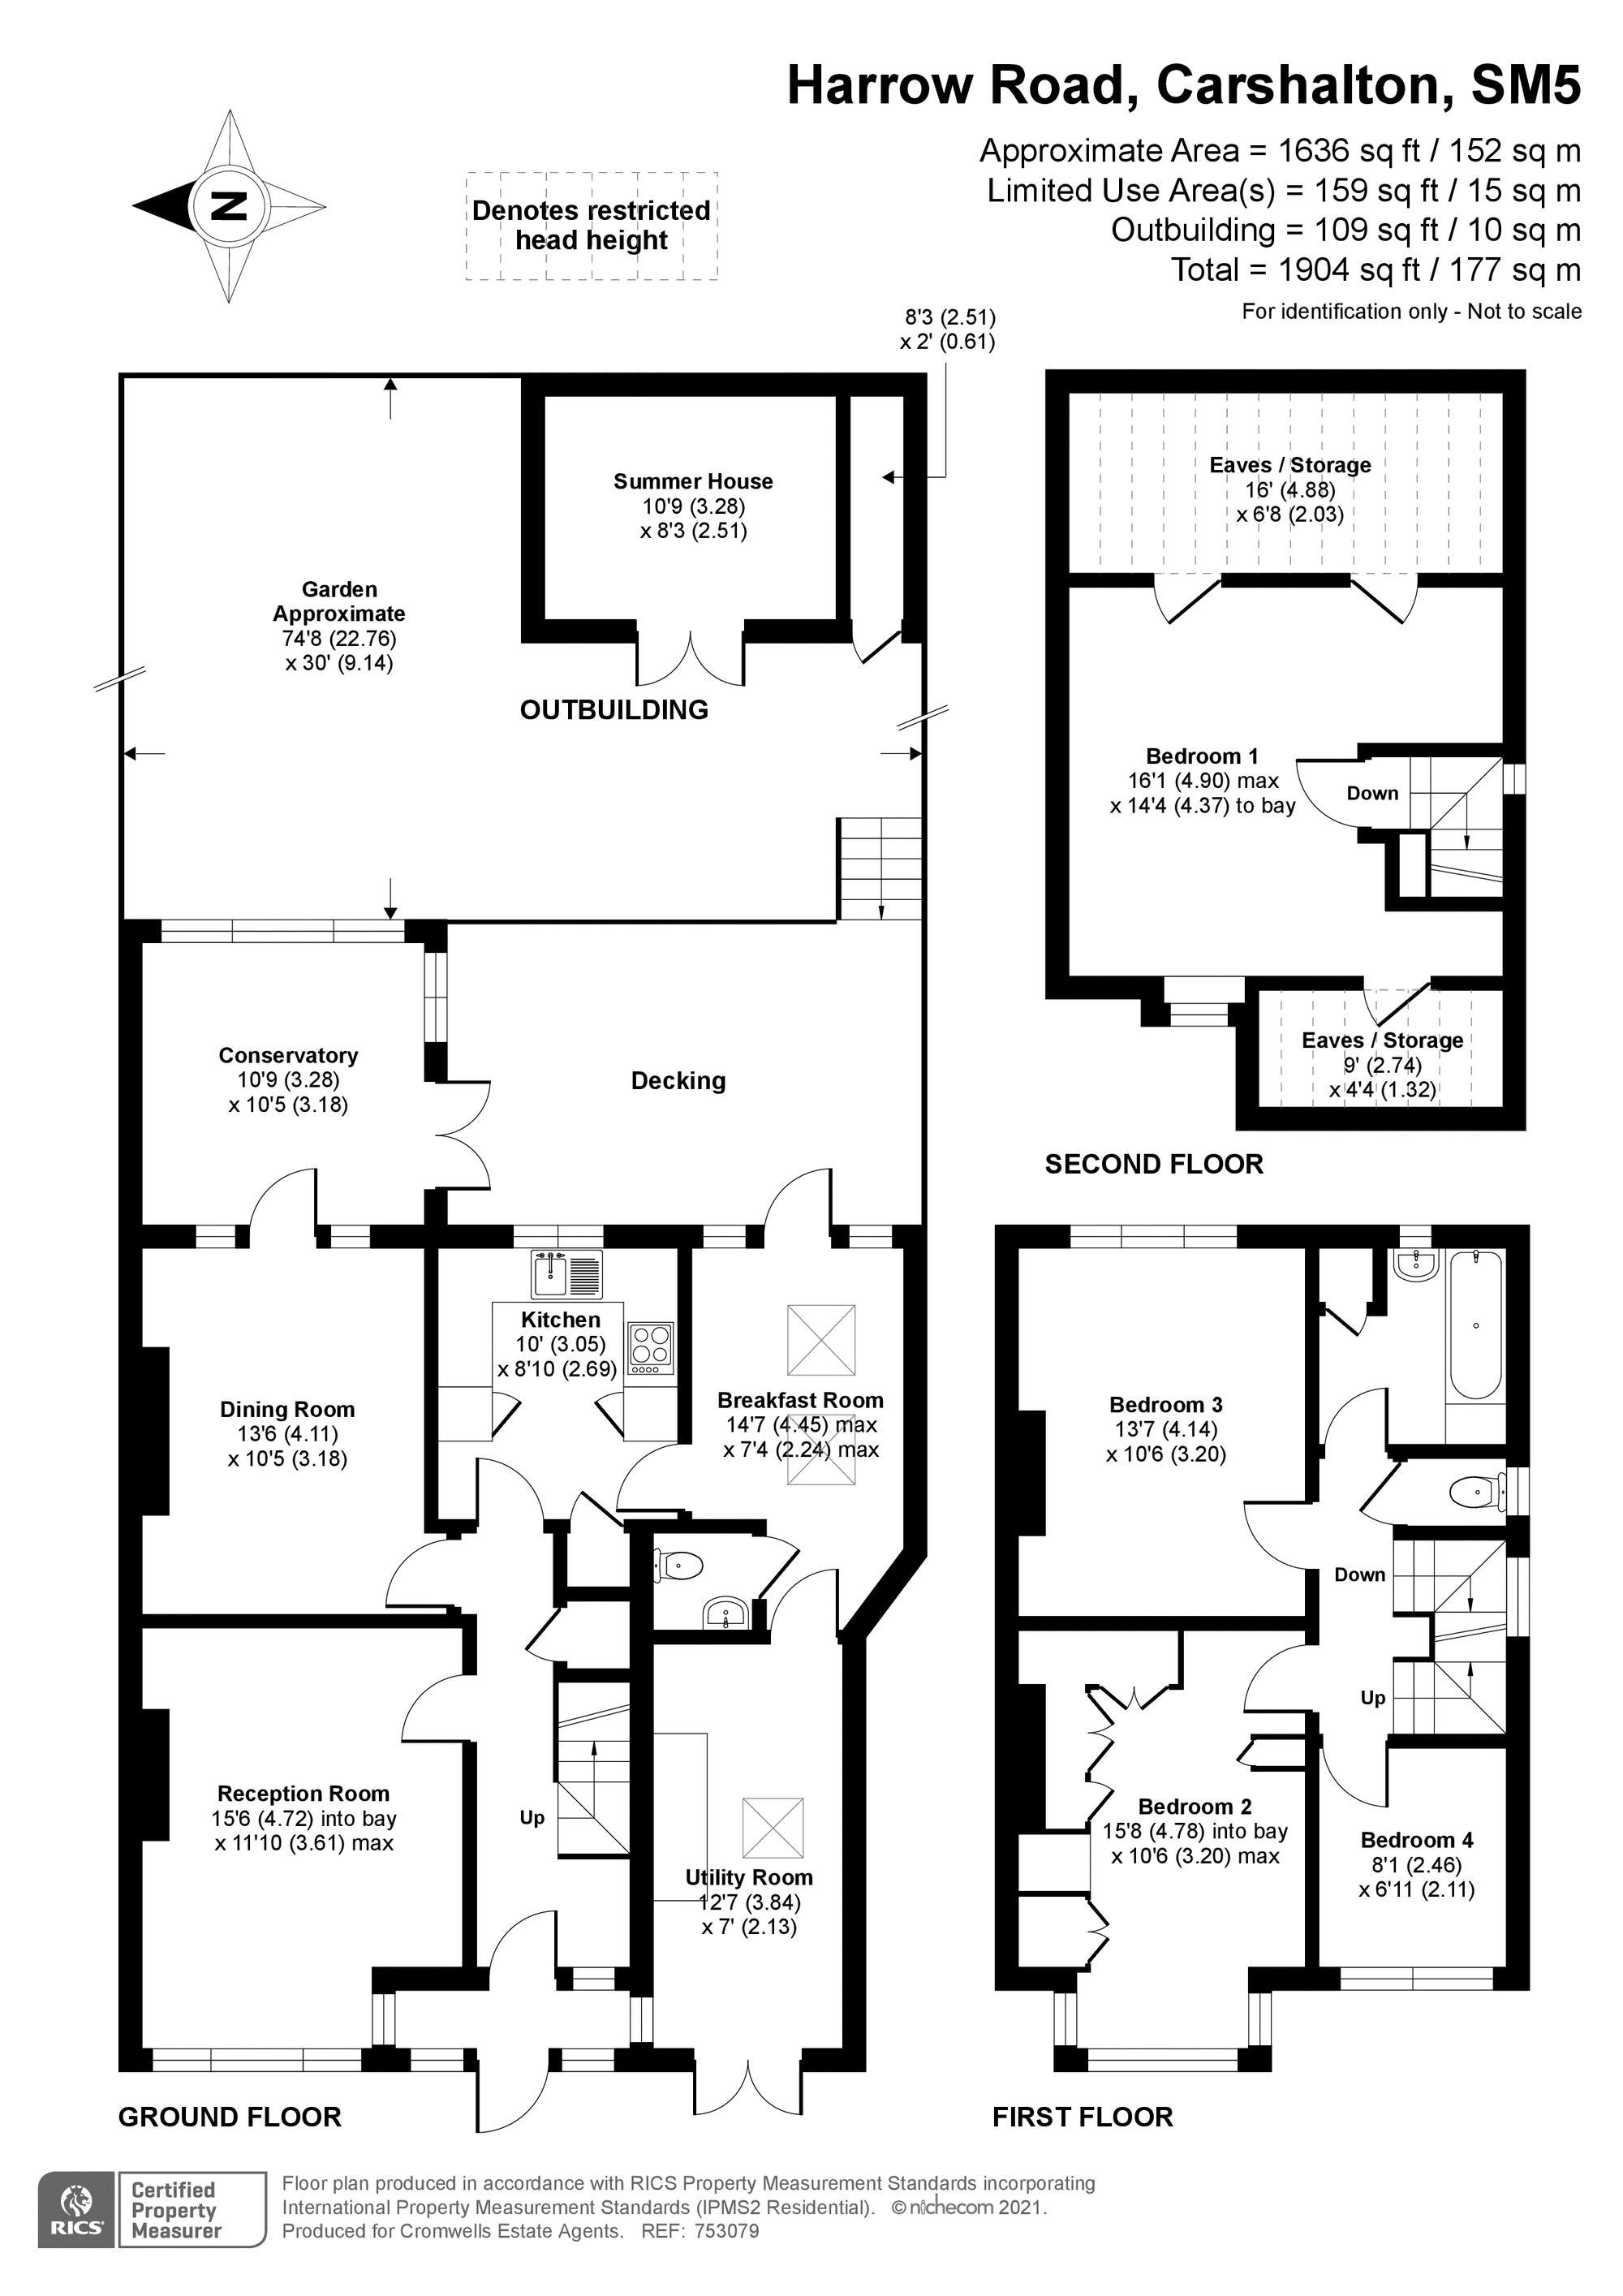 4 bedroom semi detached house SSTC in Carshalton Beeches - floorplan 1.